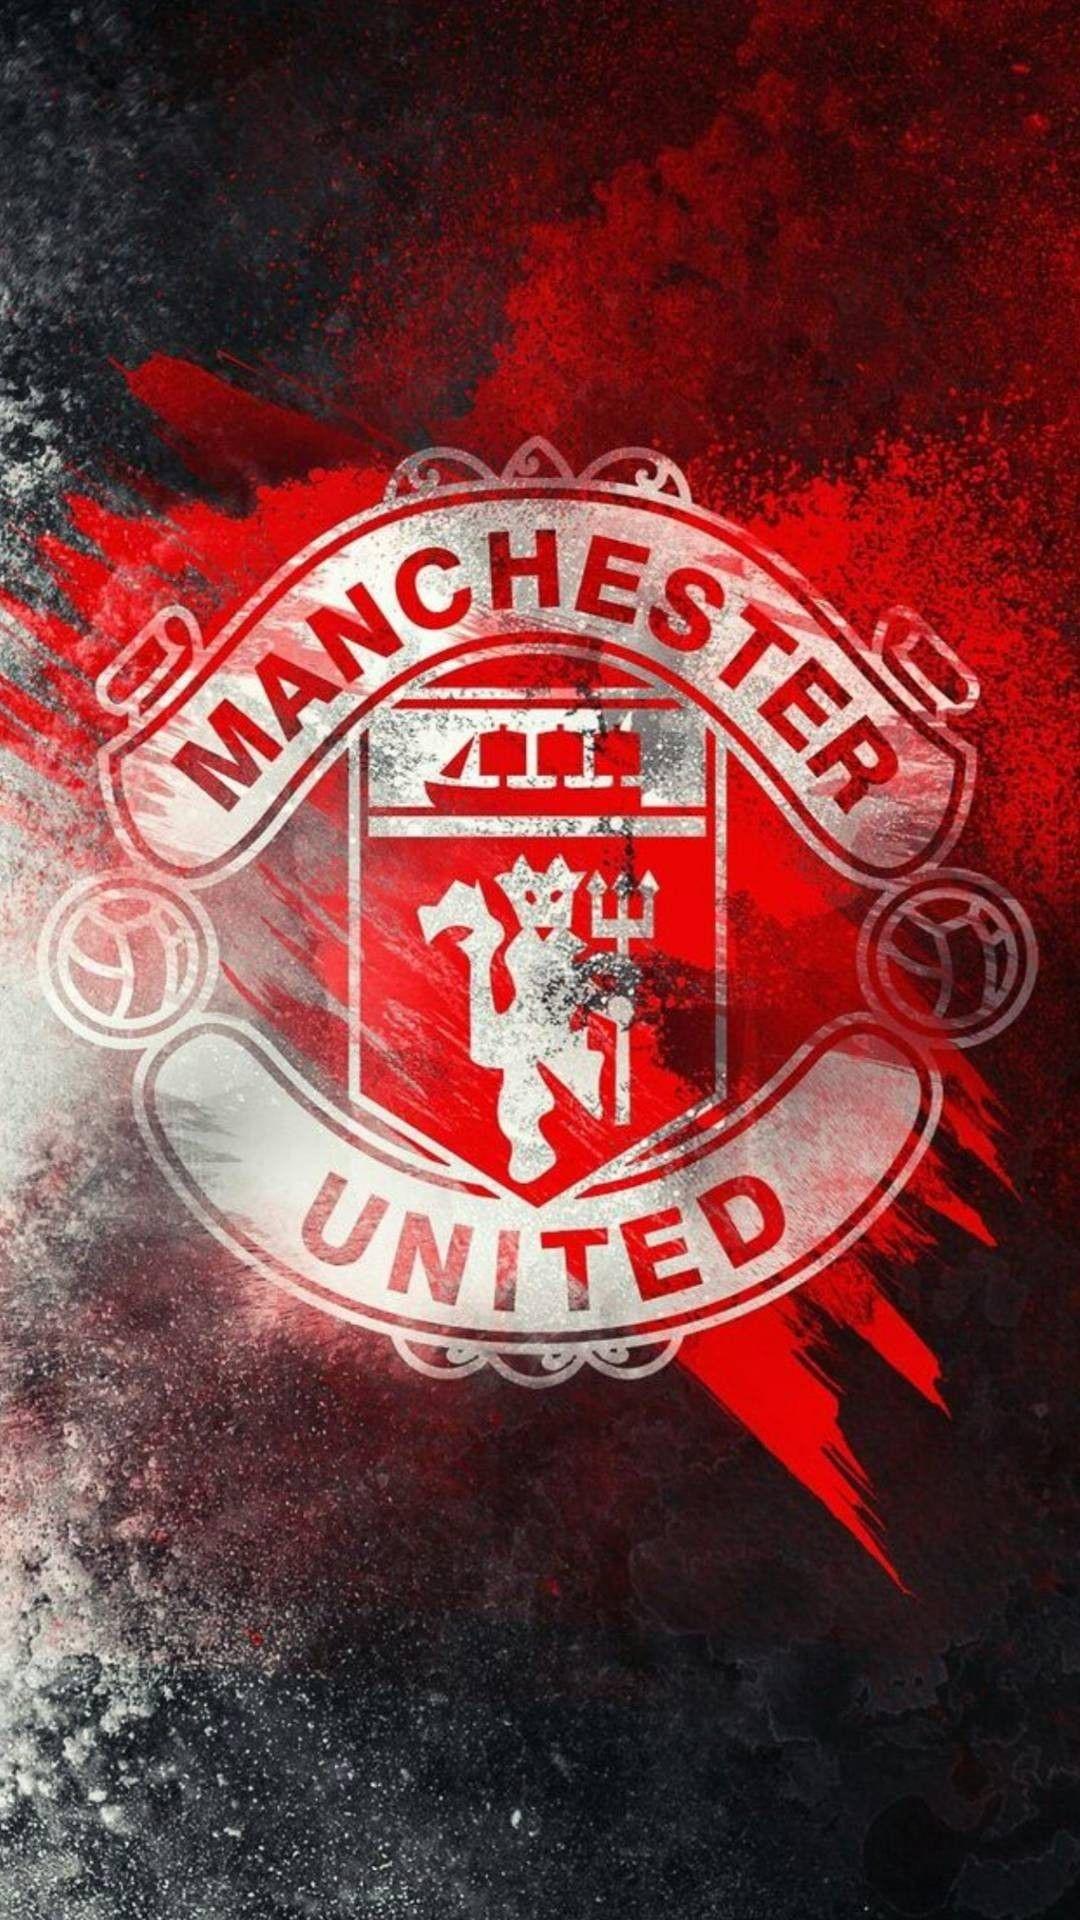 Manchester Utd phone wallpaper Manchester united